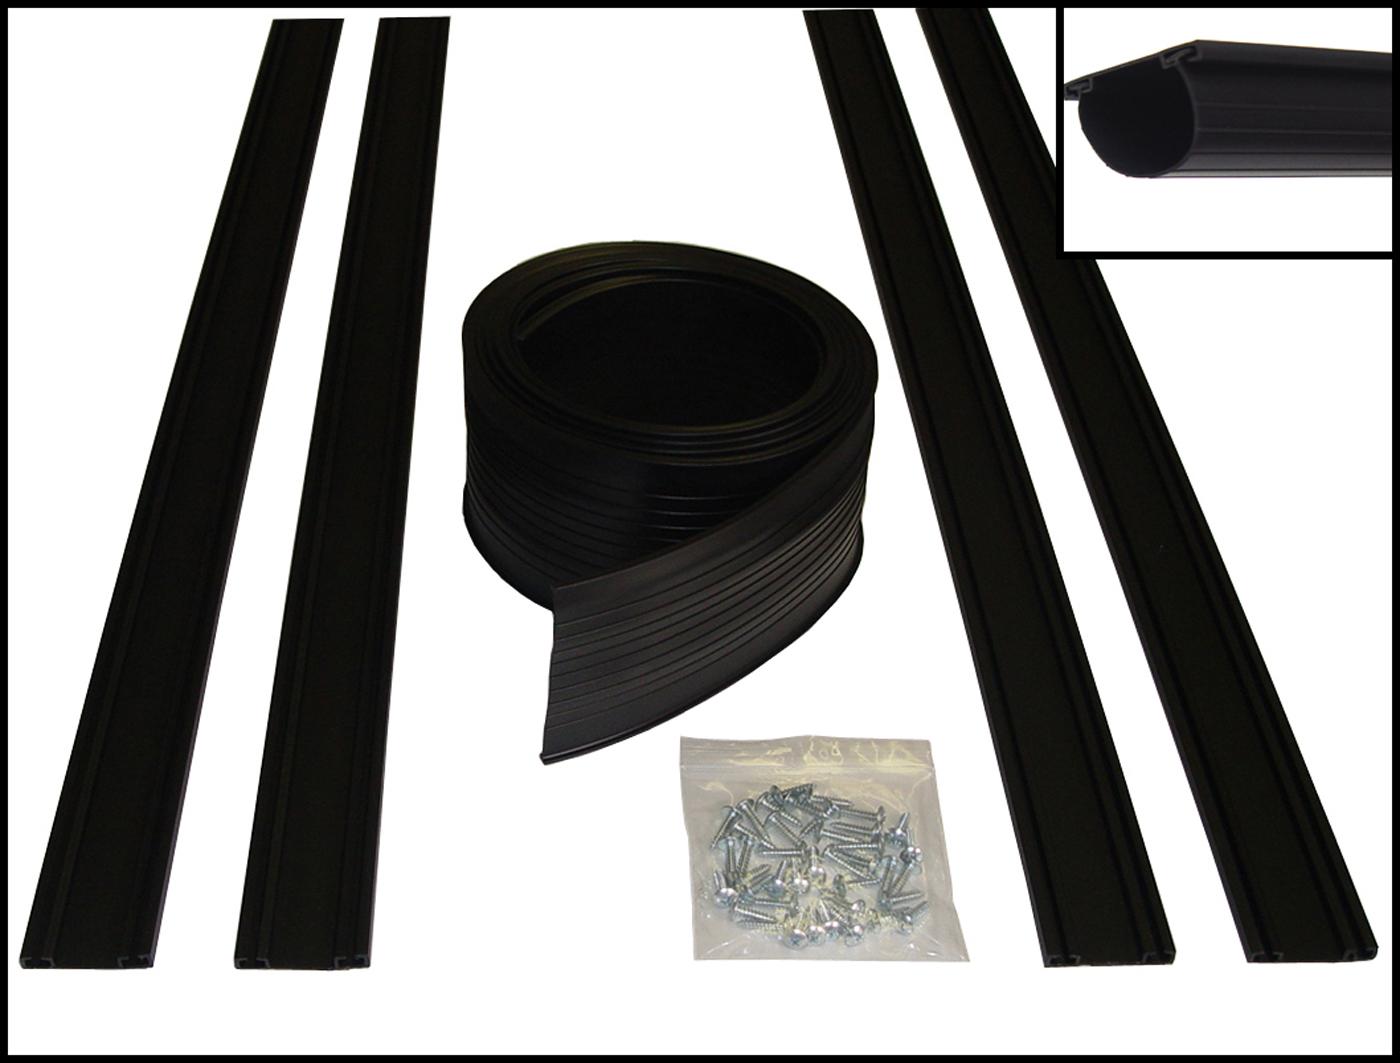 U Shaped Garage Door Bottom Seal Kit 16 Foot In Garage